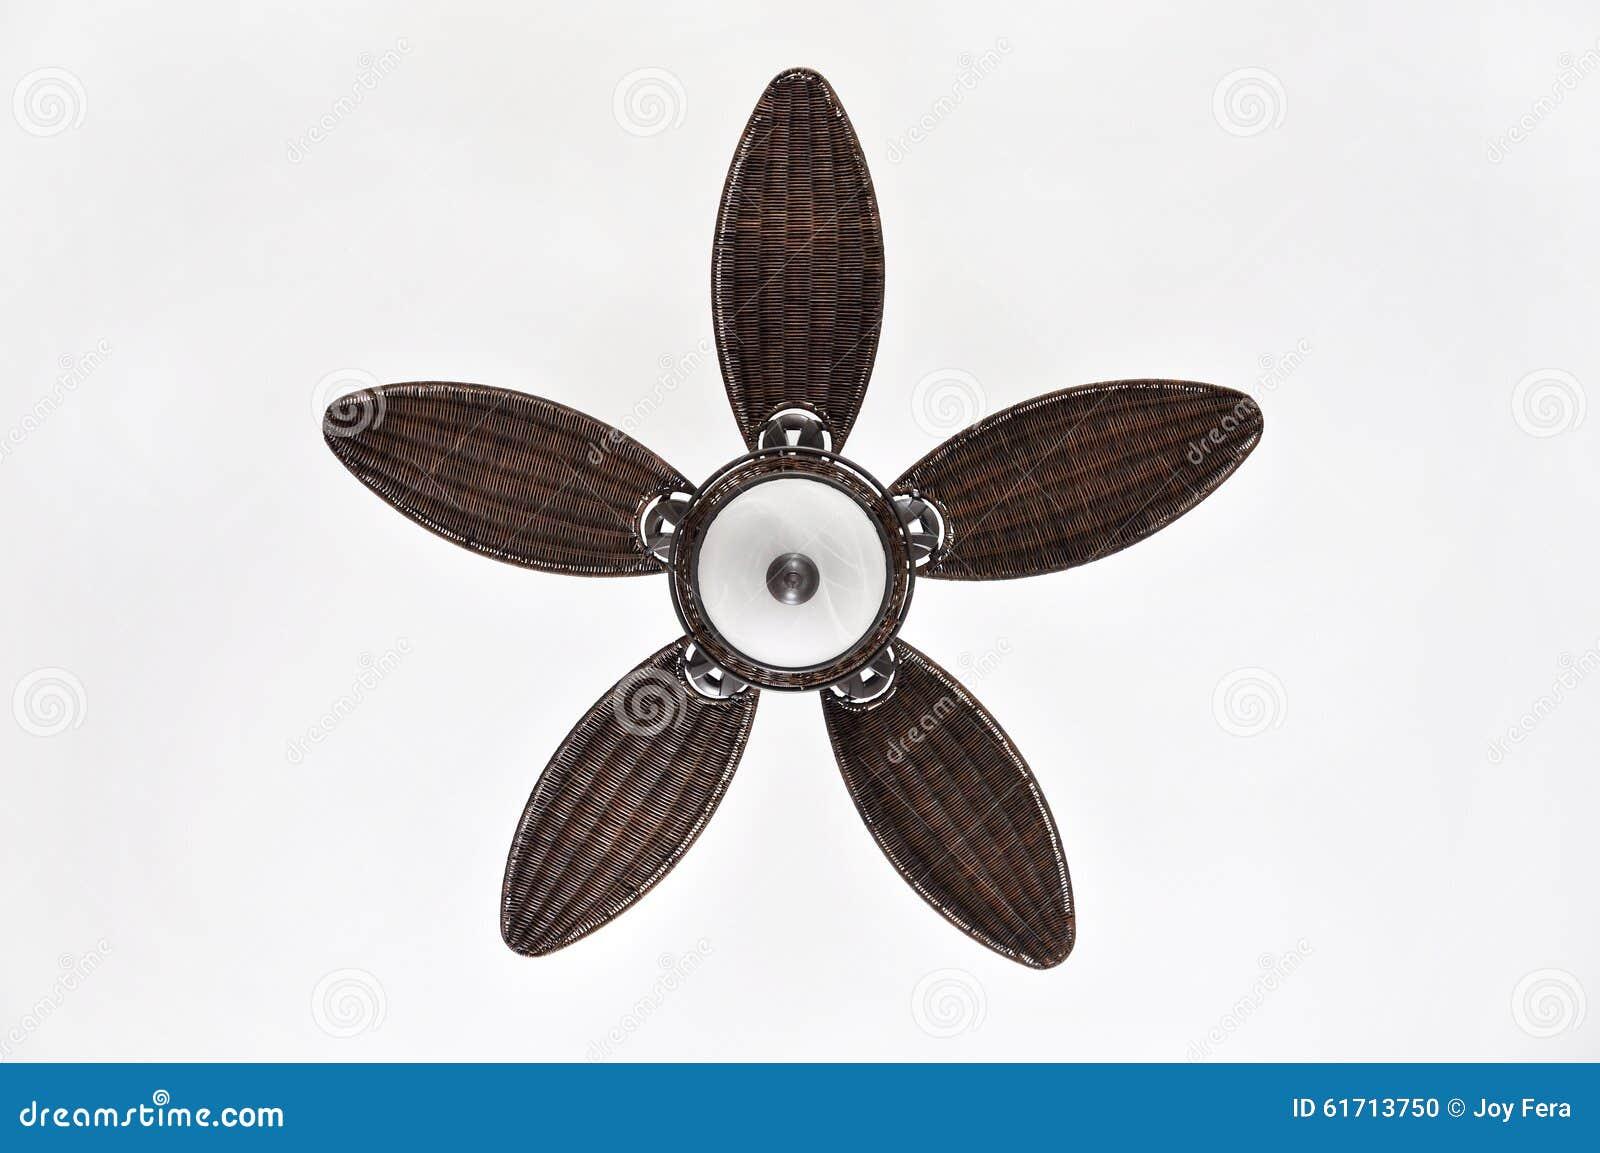 Pretty White Ceiling Fans: Pretty Brown Wicker Ceiling Fan Against White Background